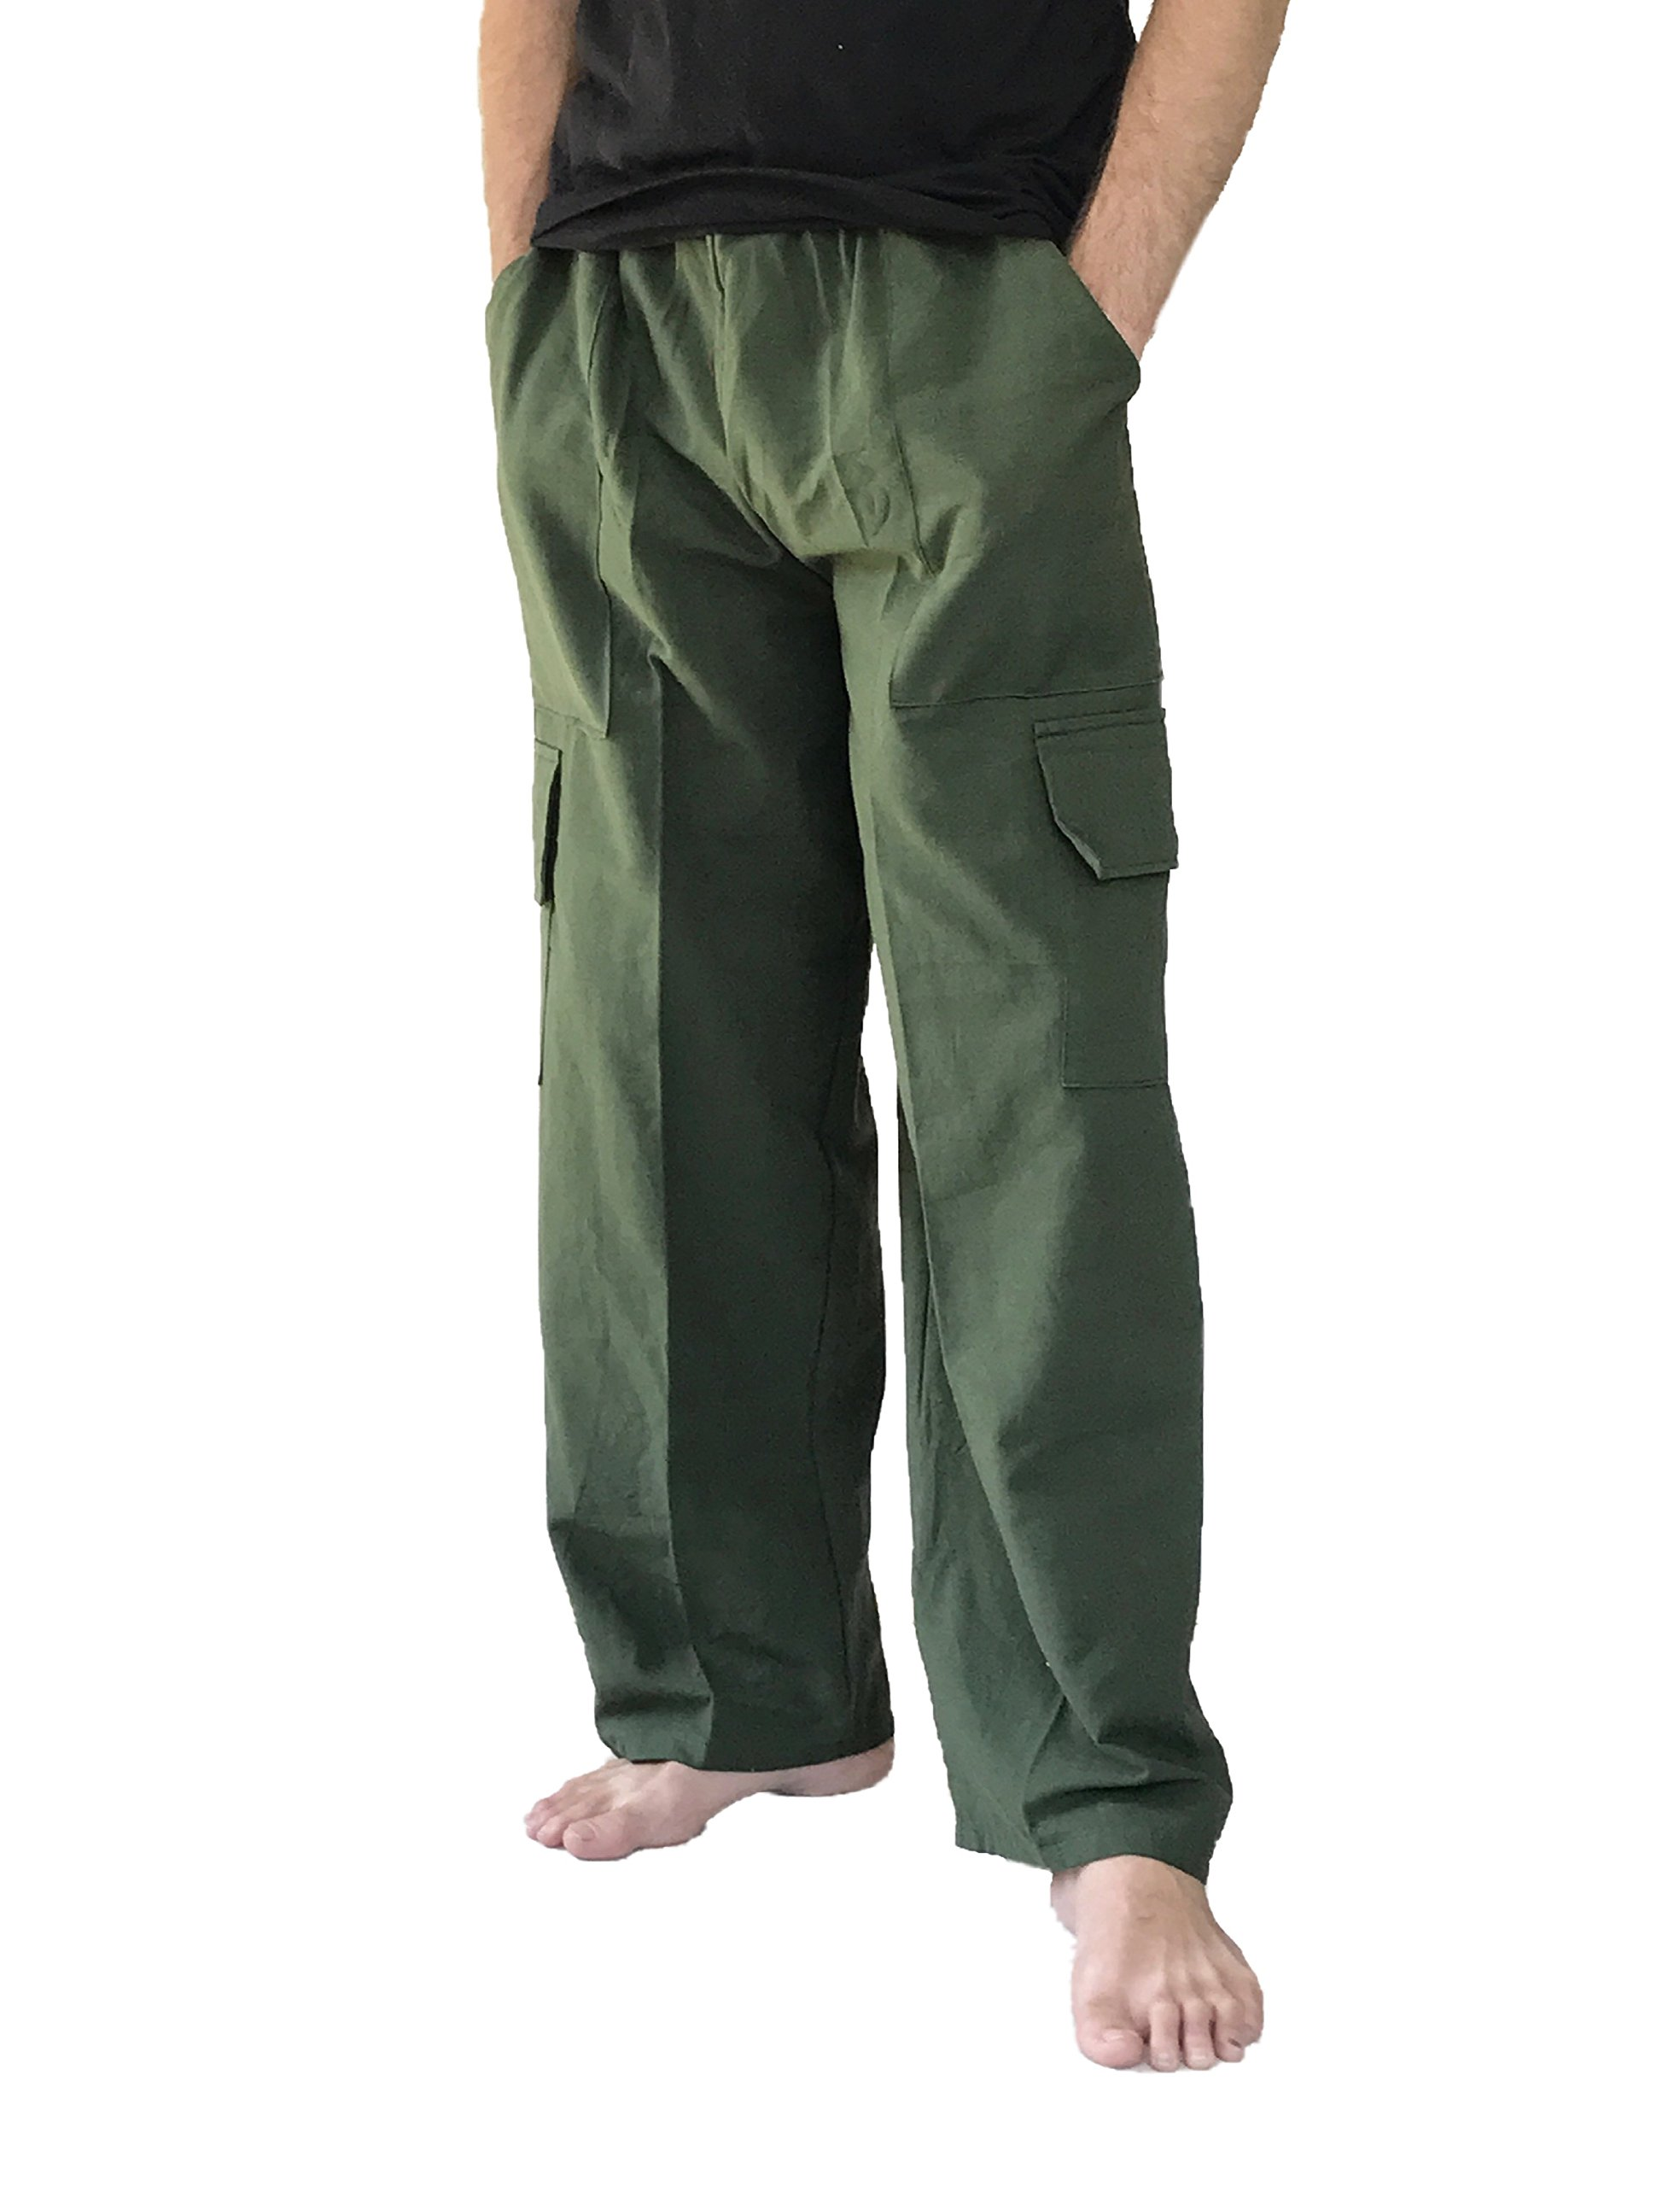 Love Quality Men's 100% Cotton Cargo Pants Plus Size Baggy Pants Drawstring Elastic Waist (Green)